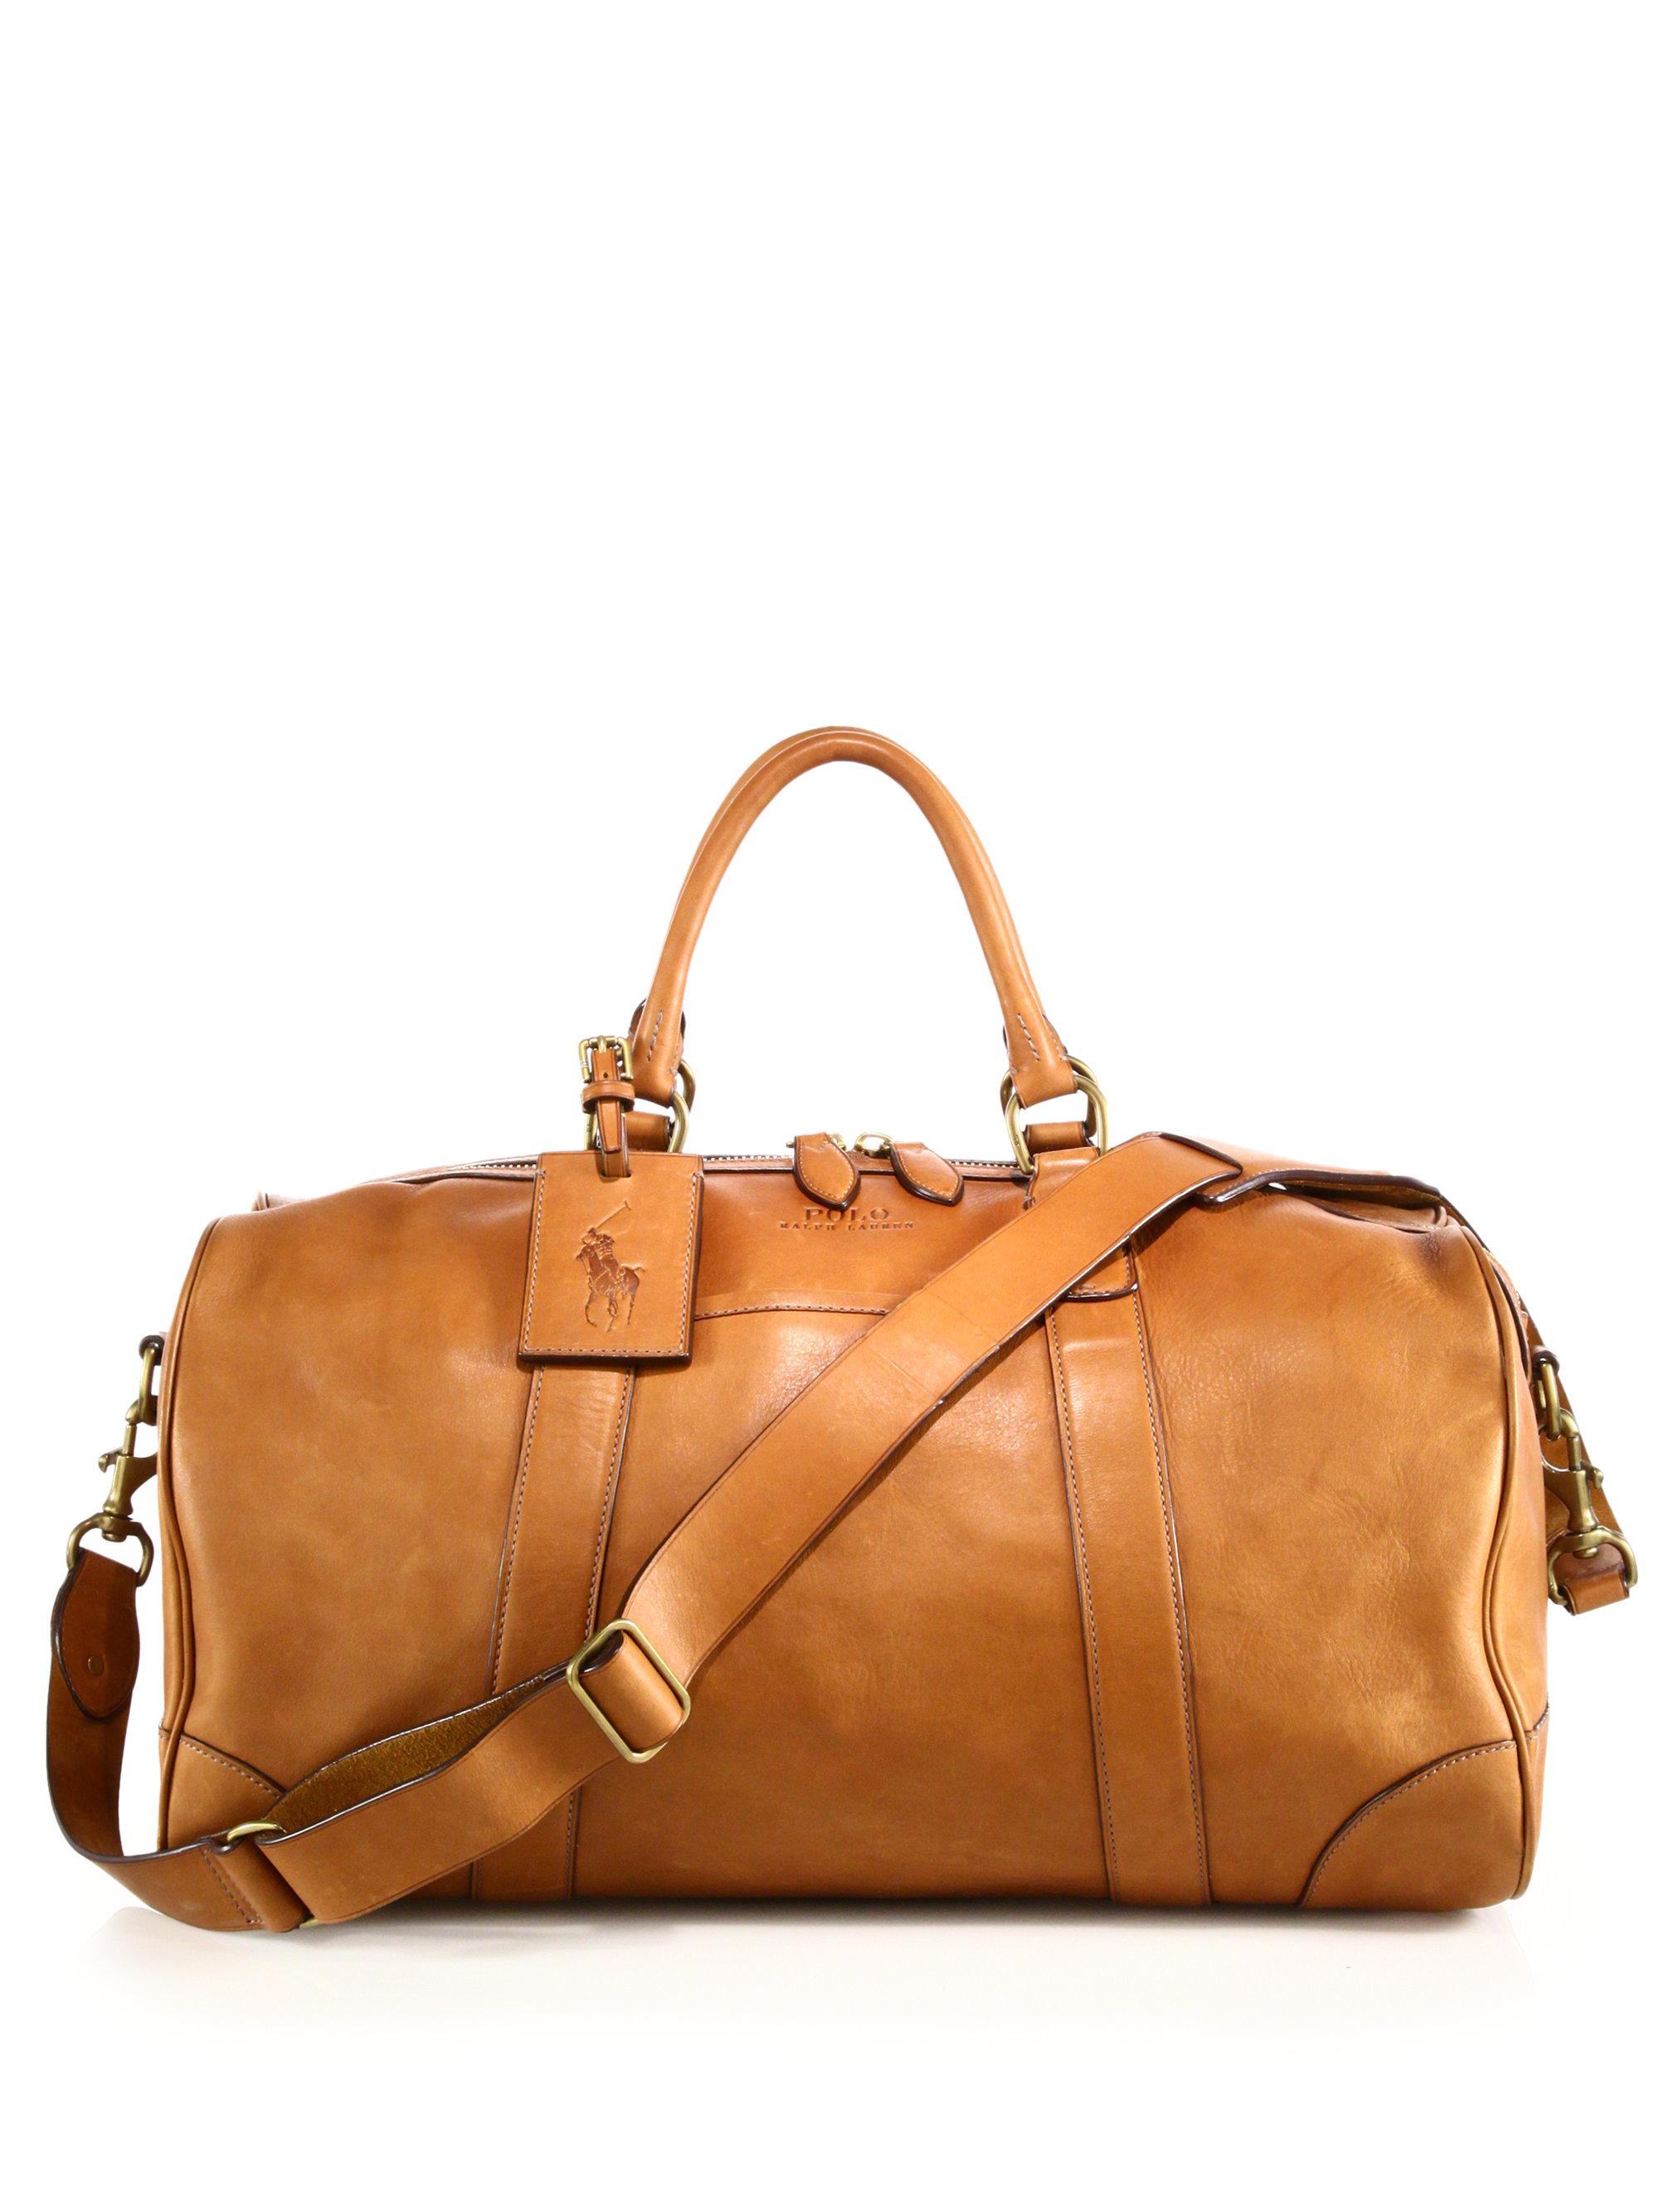 Saks Fifth Avenue Men S Travel Bag